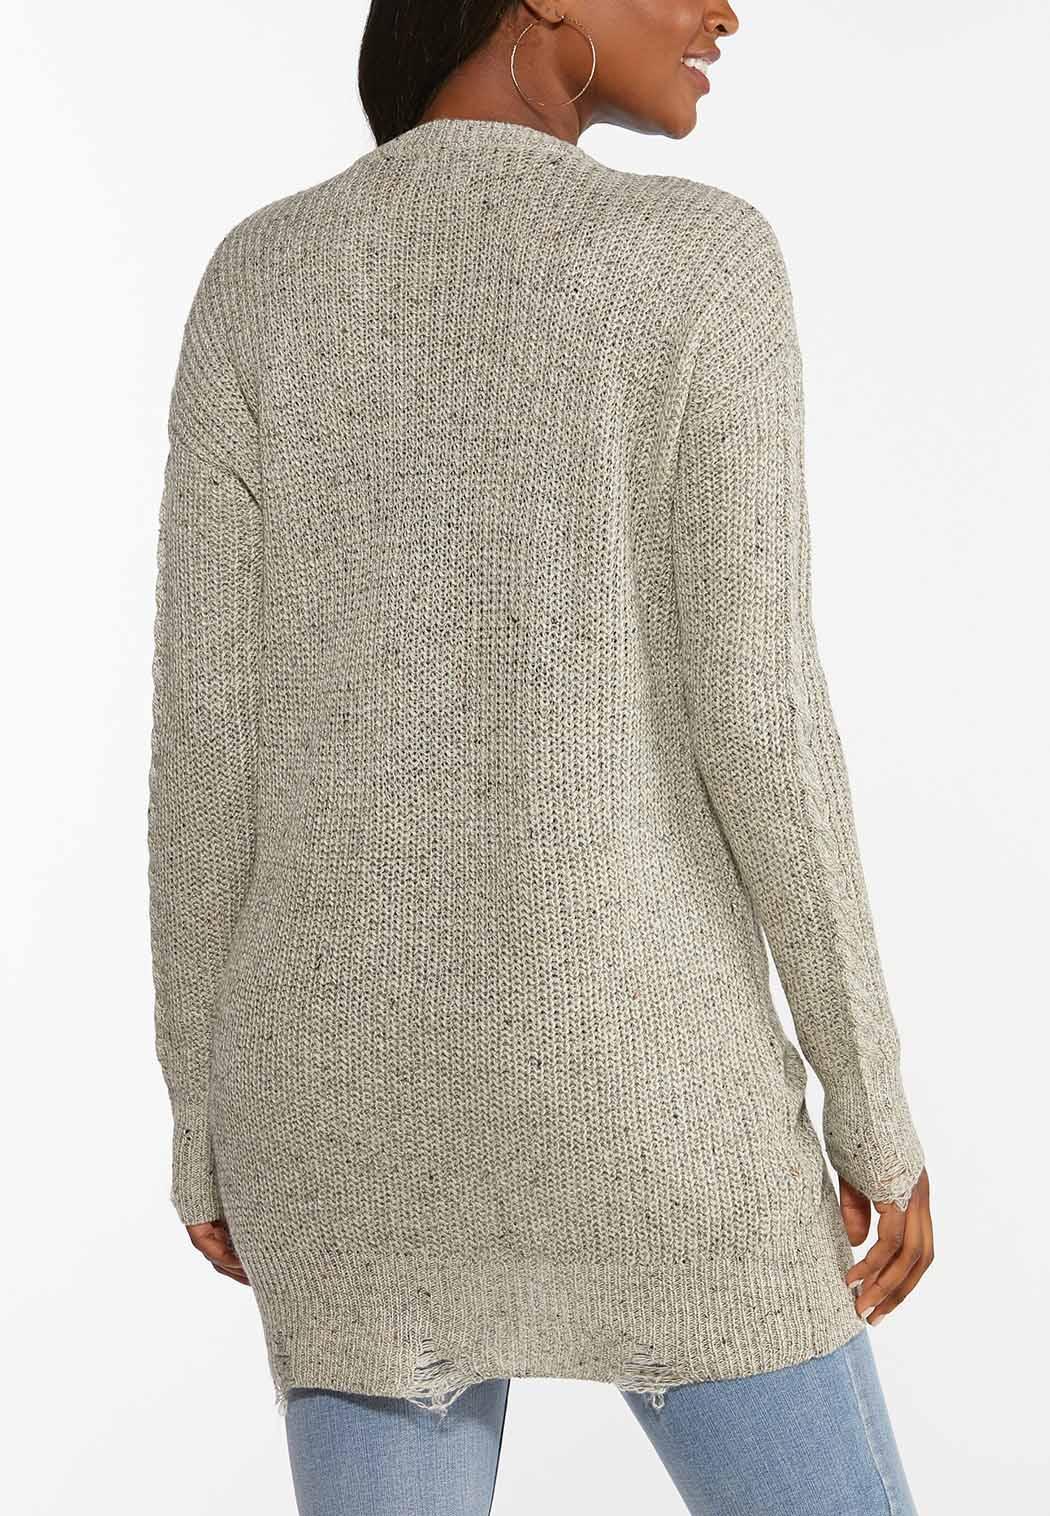 Distressed Cardigan Sweater (Item #44431119)